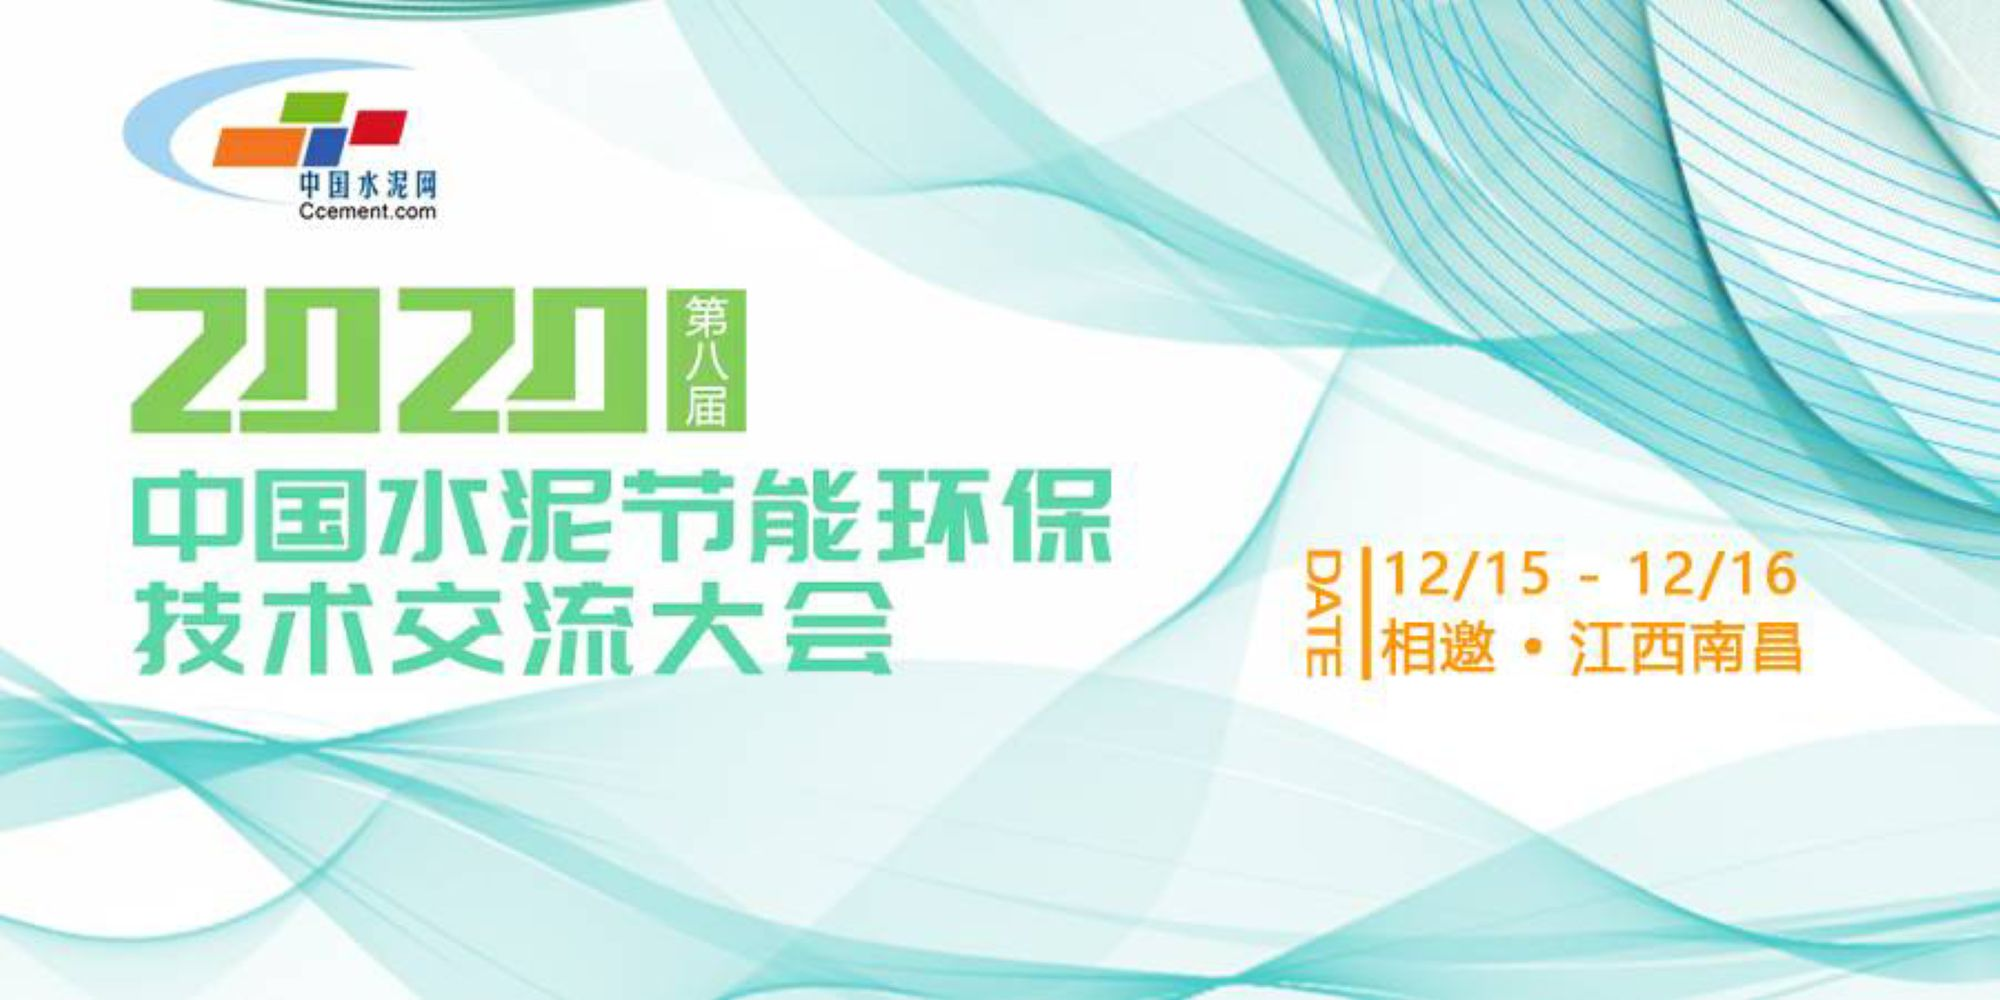 CN-8thCementConference-invite-900x450.jpg